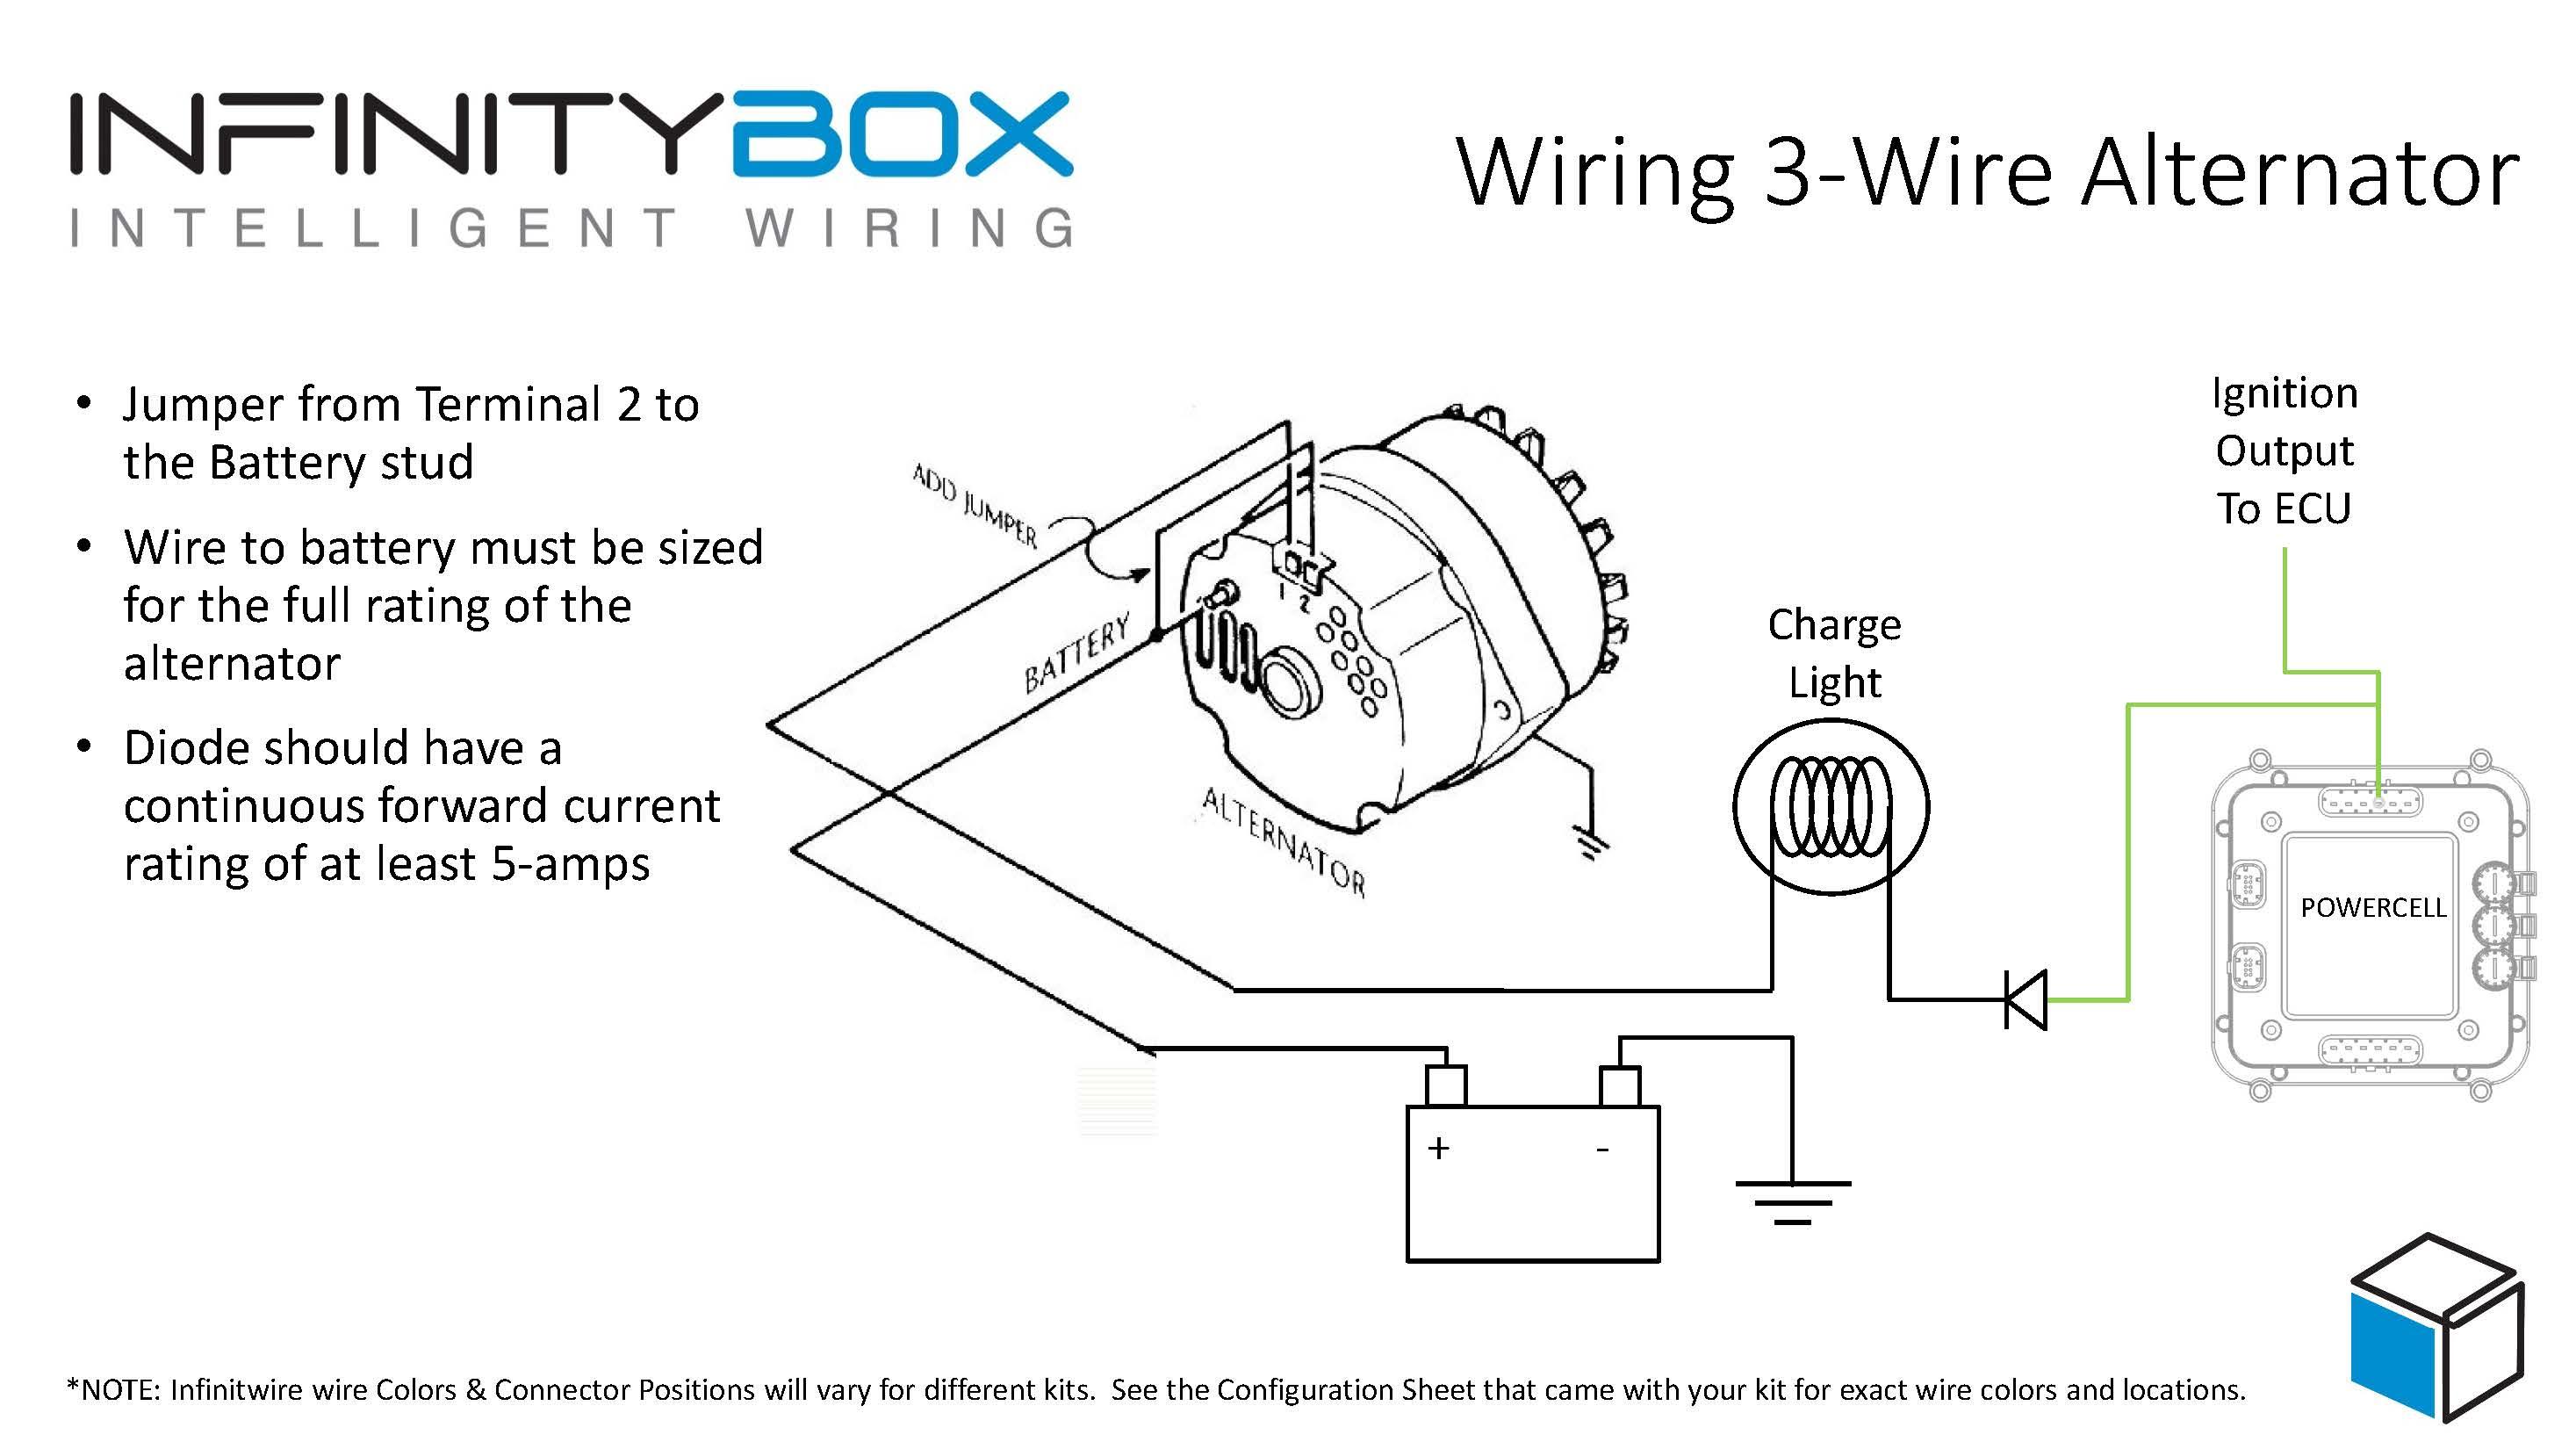 [TBQL_4184]  CC_2787] Magneti Marelli Alternator Wiring Diagram Schematic Wiring | International Alternator Wiring Diagram |  | Umng Emba Cran Xolia Shopa Mohammedshrine Librar Wiring 101